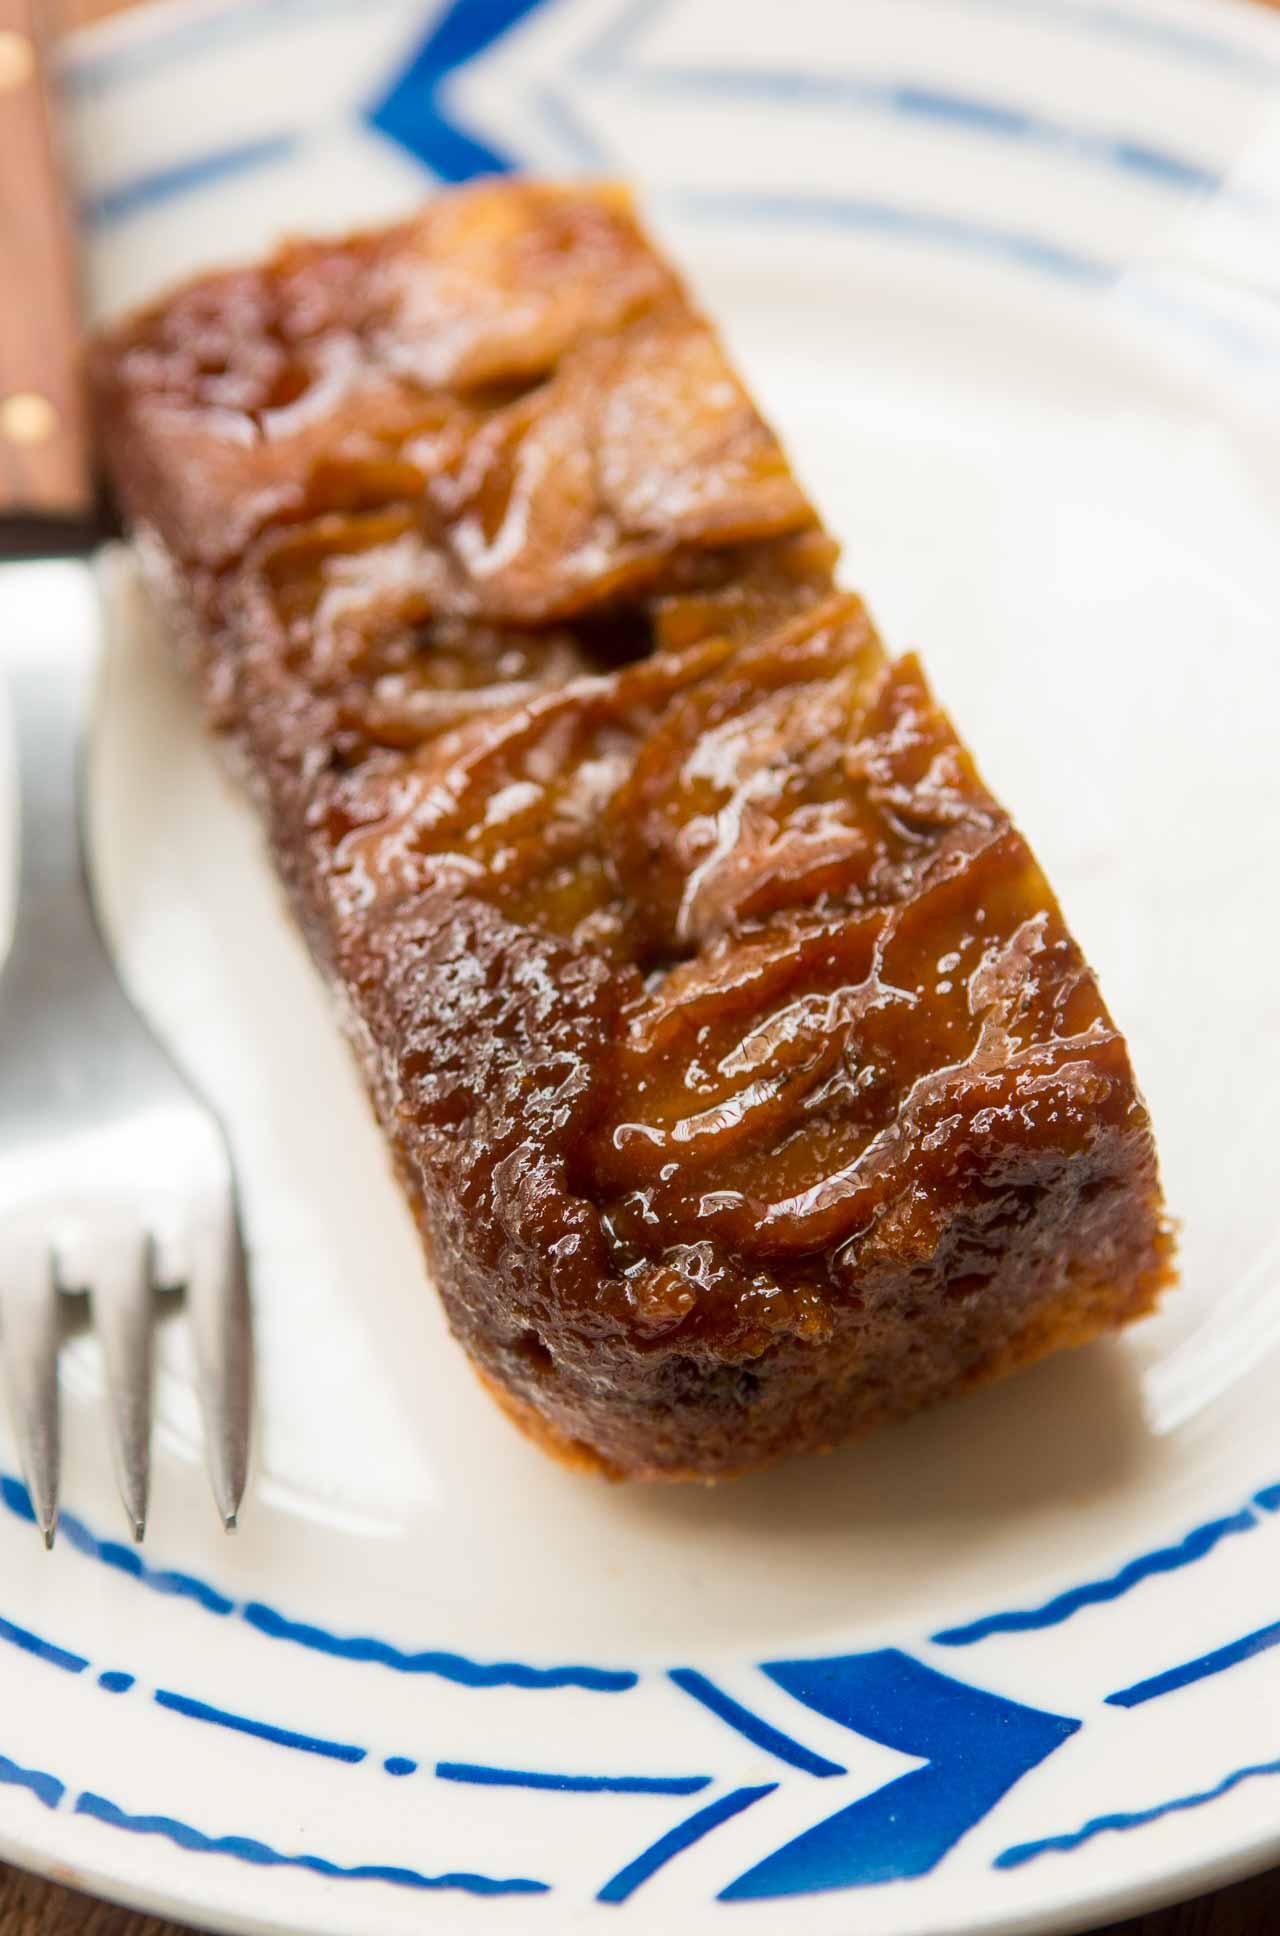 Banana and Chocolate Chip Upside Down Cake (Lowfat)